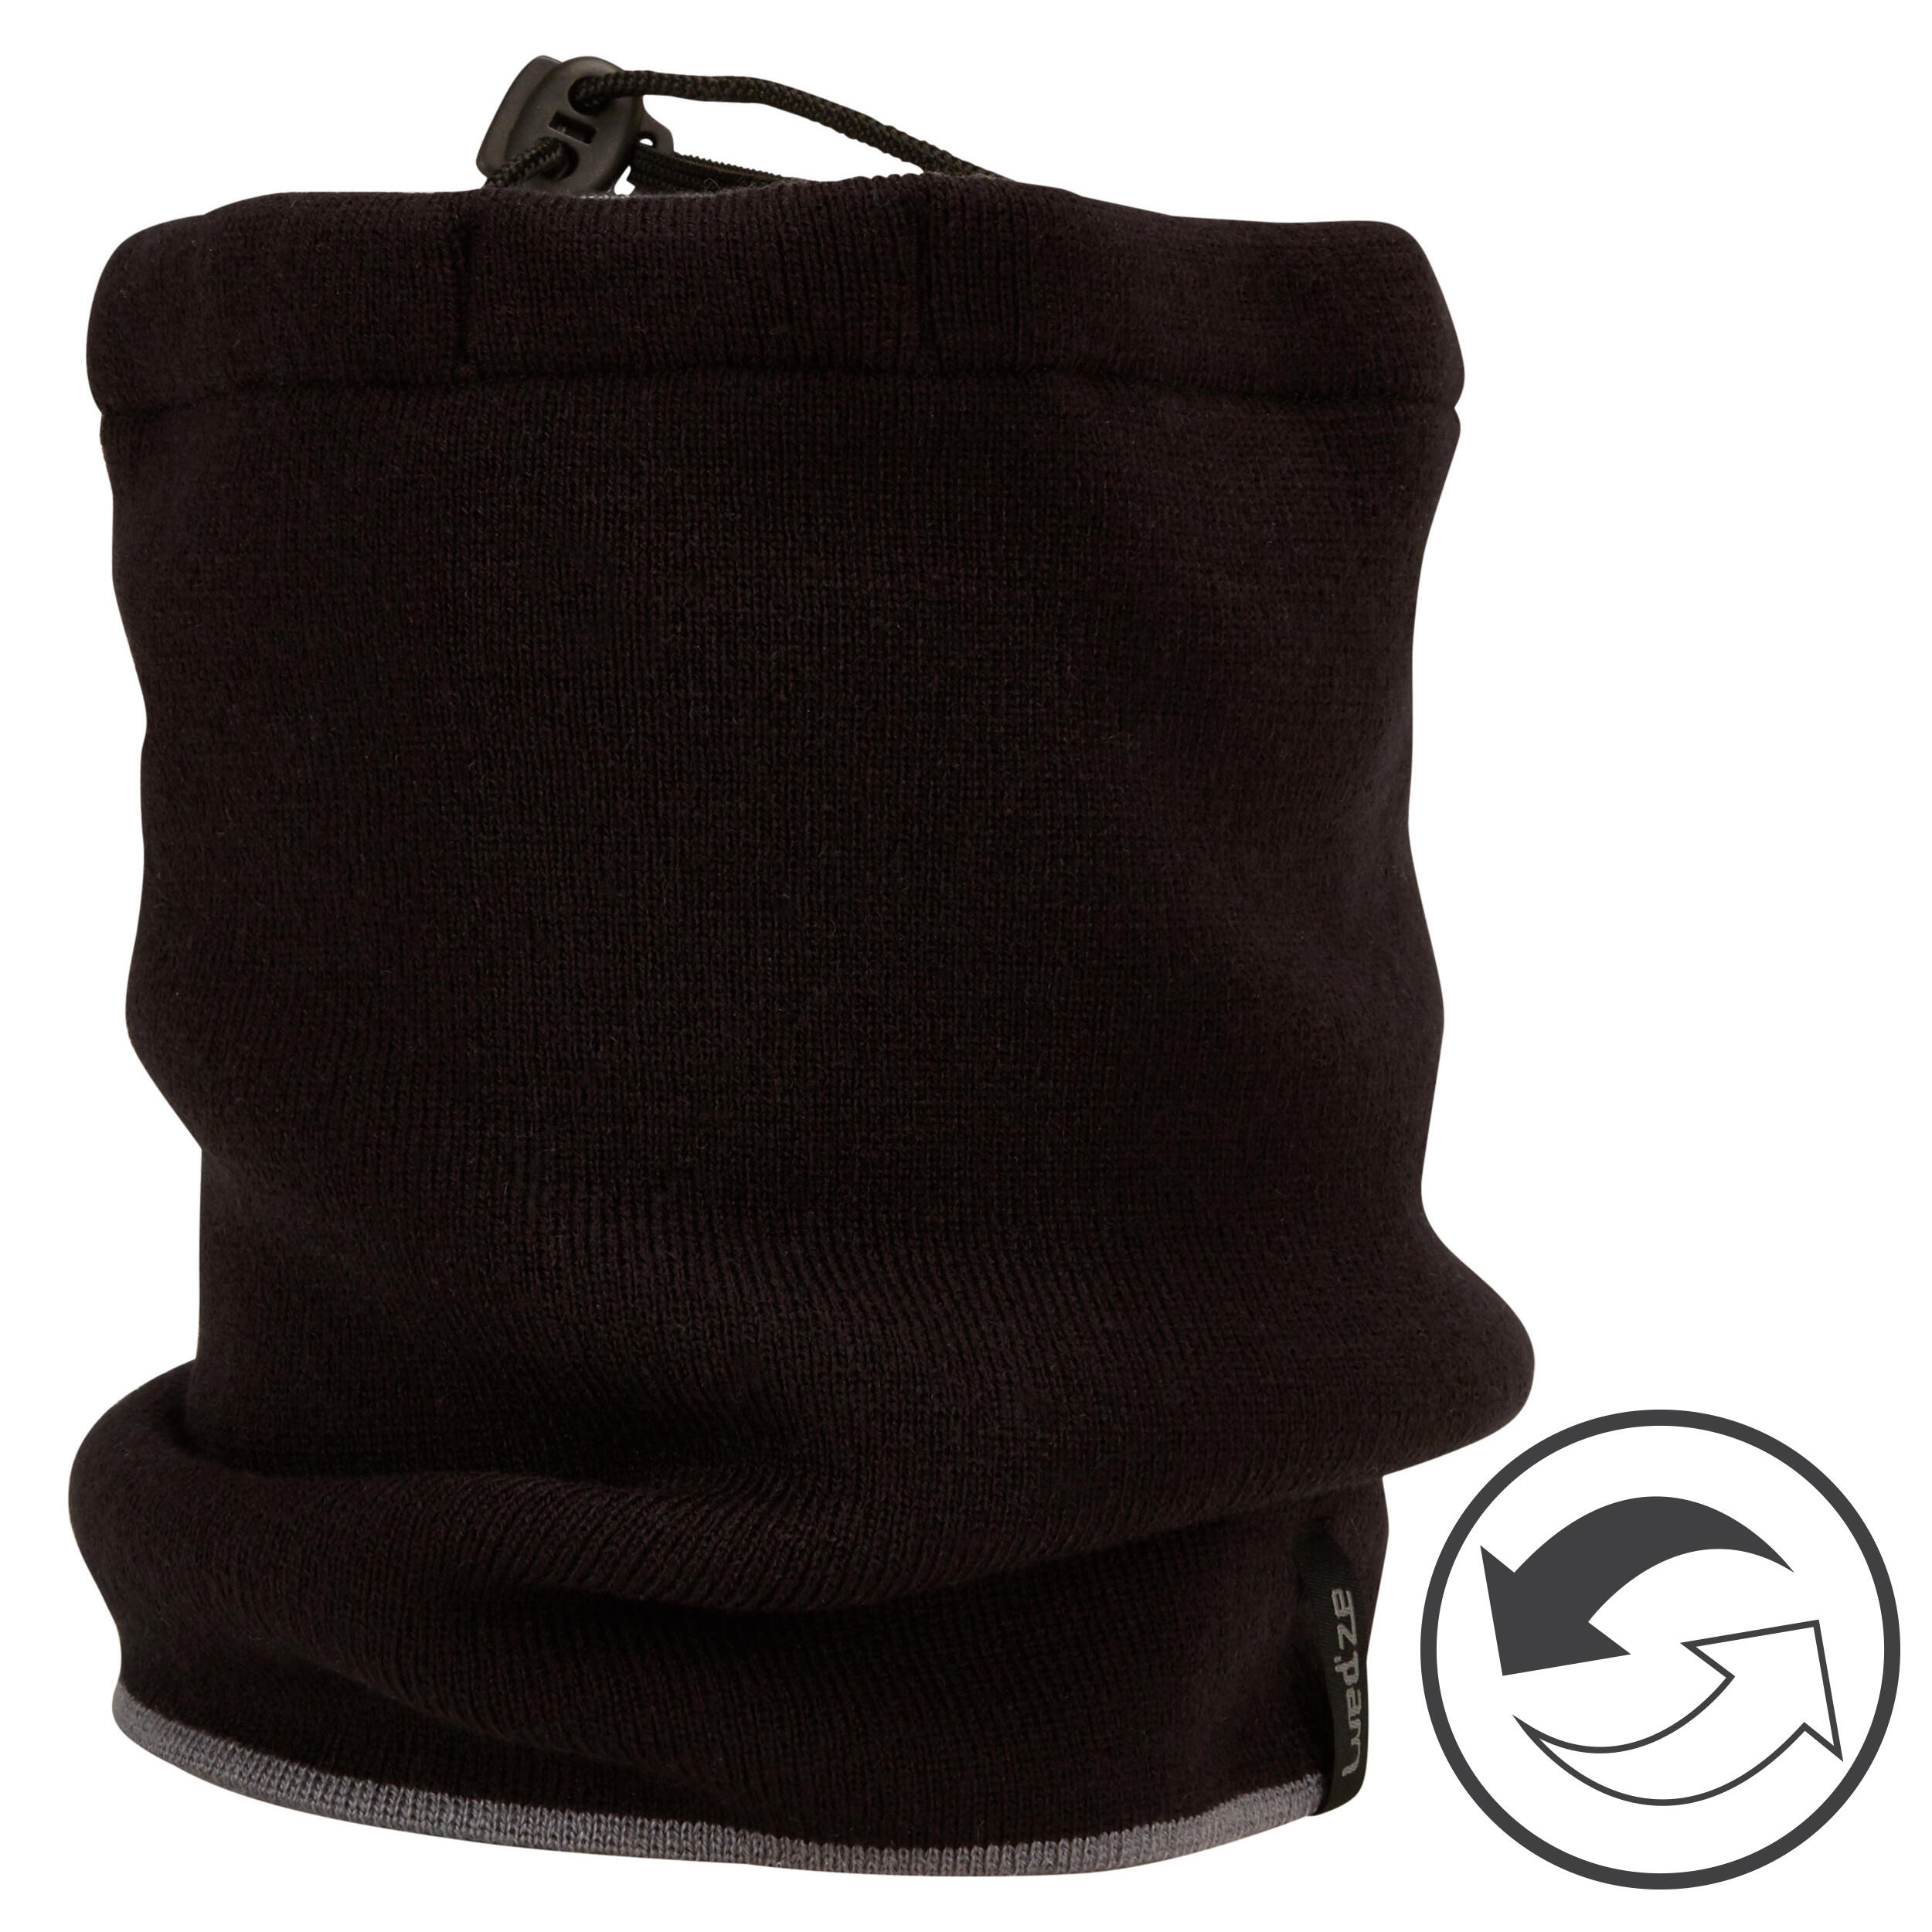 Schlauchschal Reverse Erwachsene | Accessoires > Schals & Tücher | Wedze